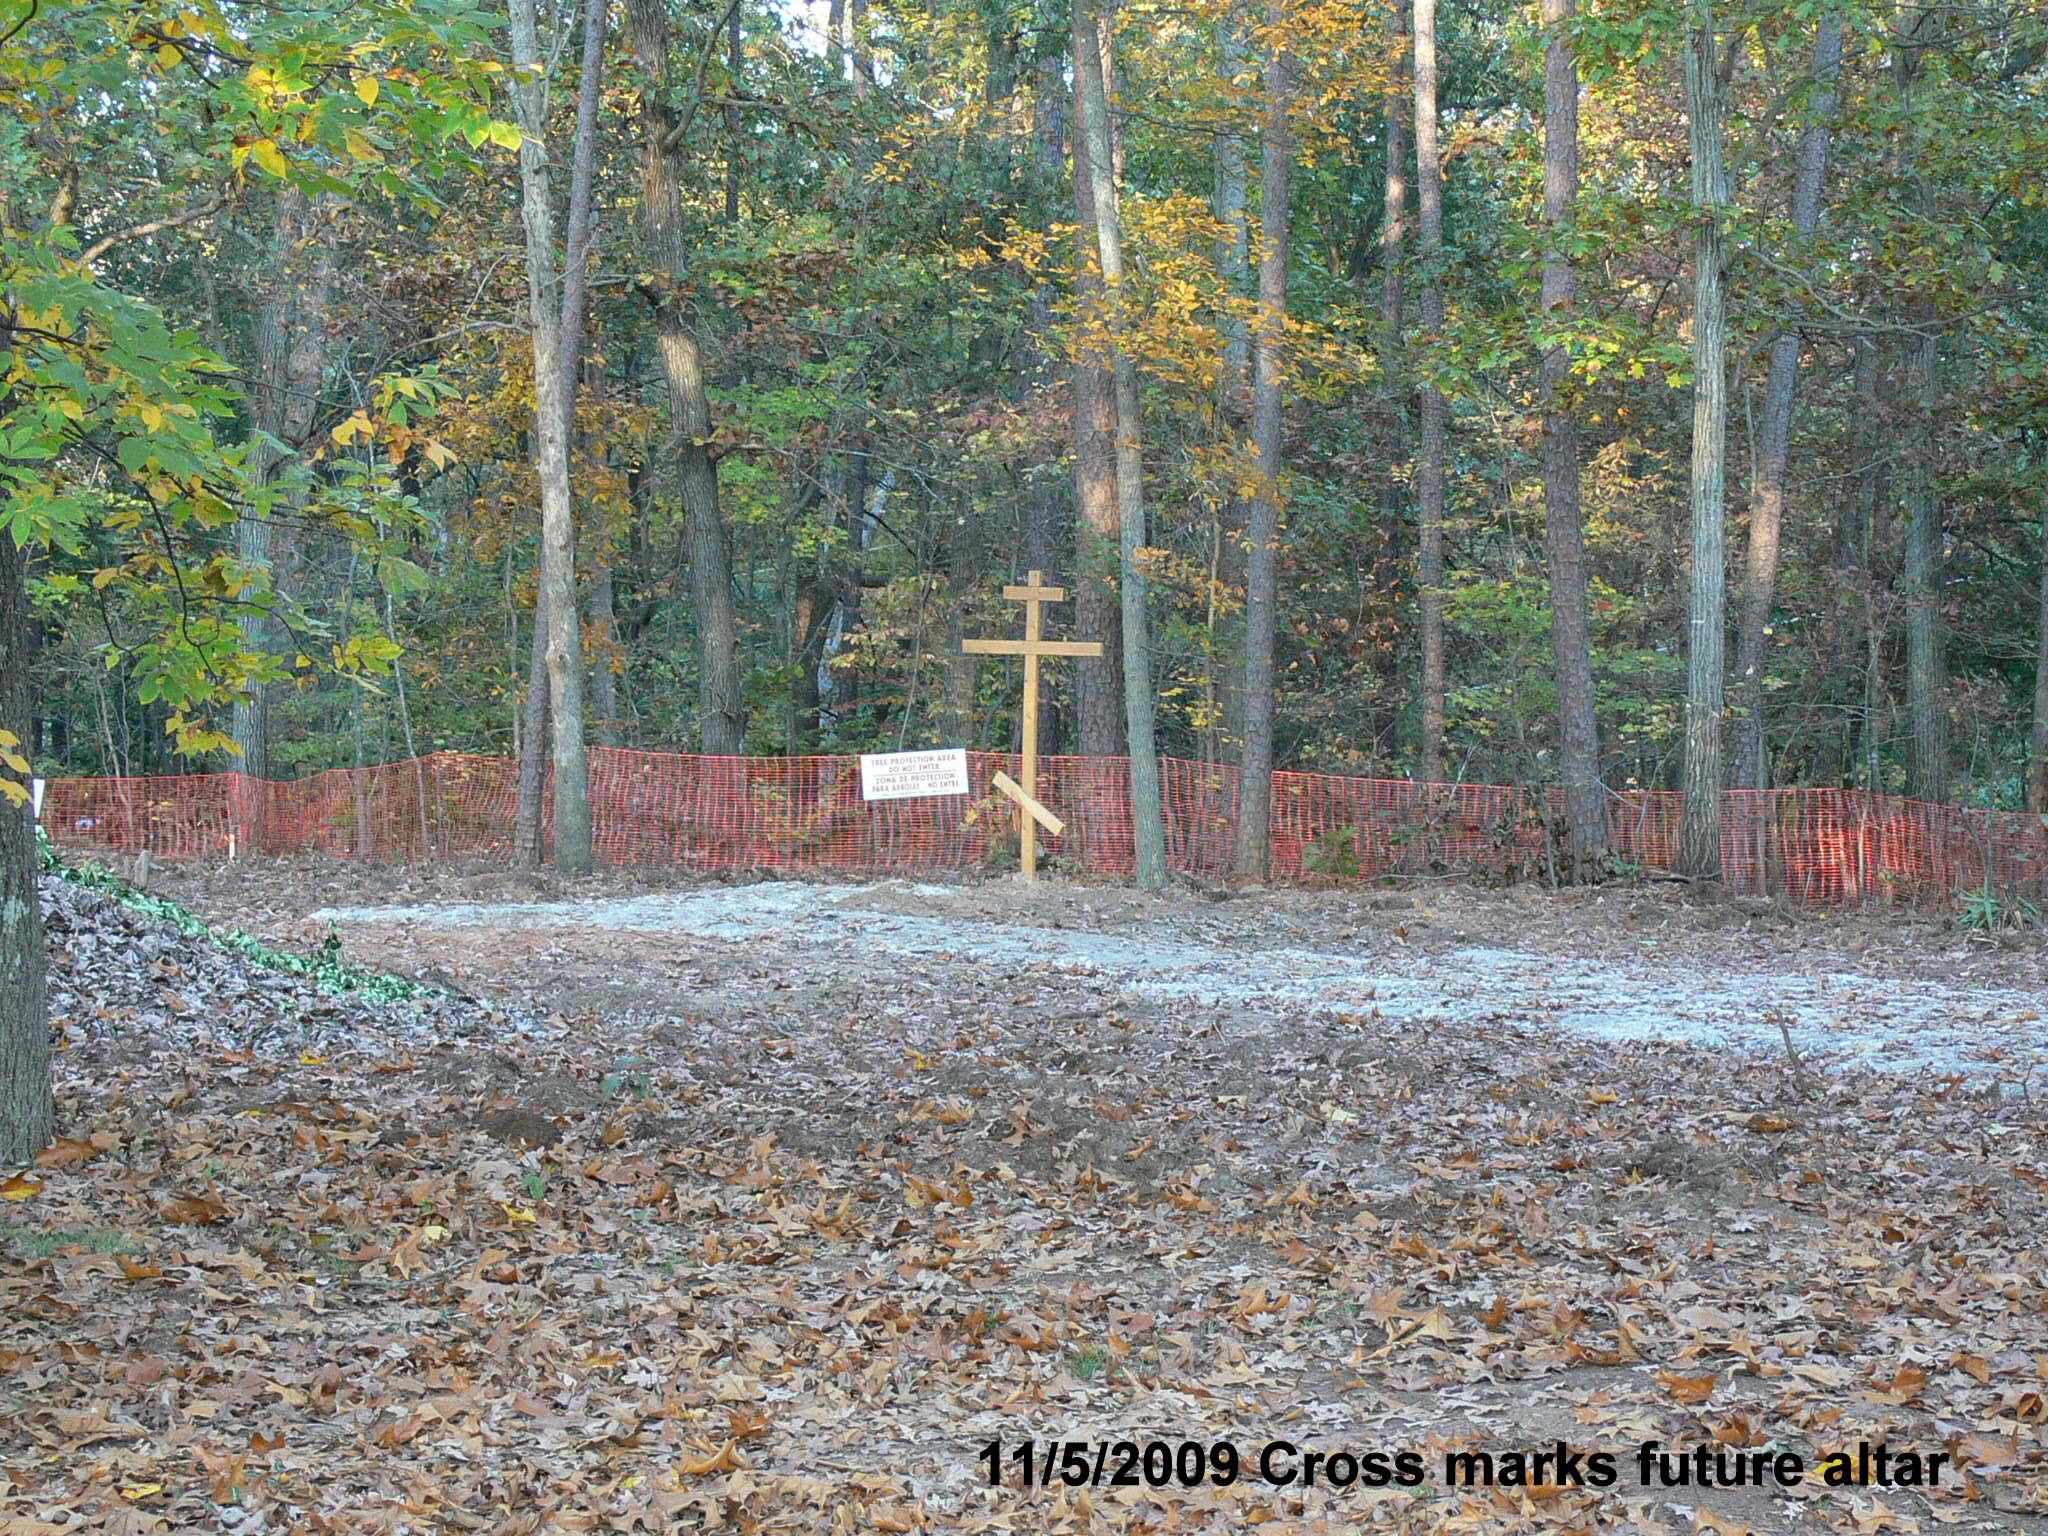 Cross Marks Future Altar